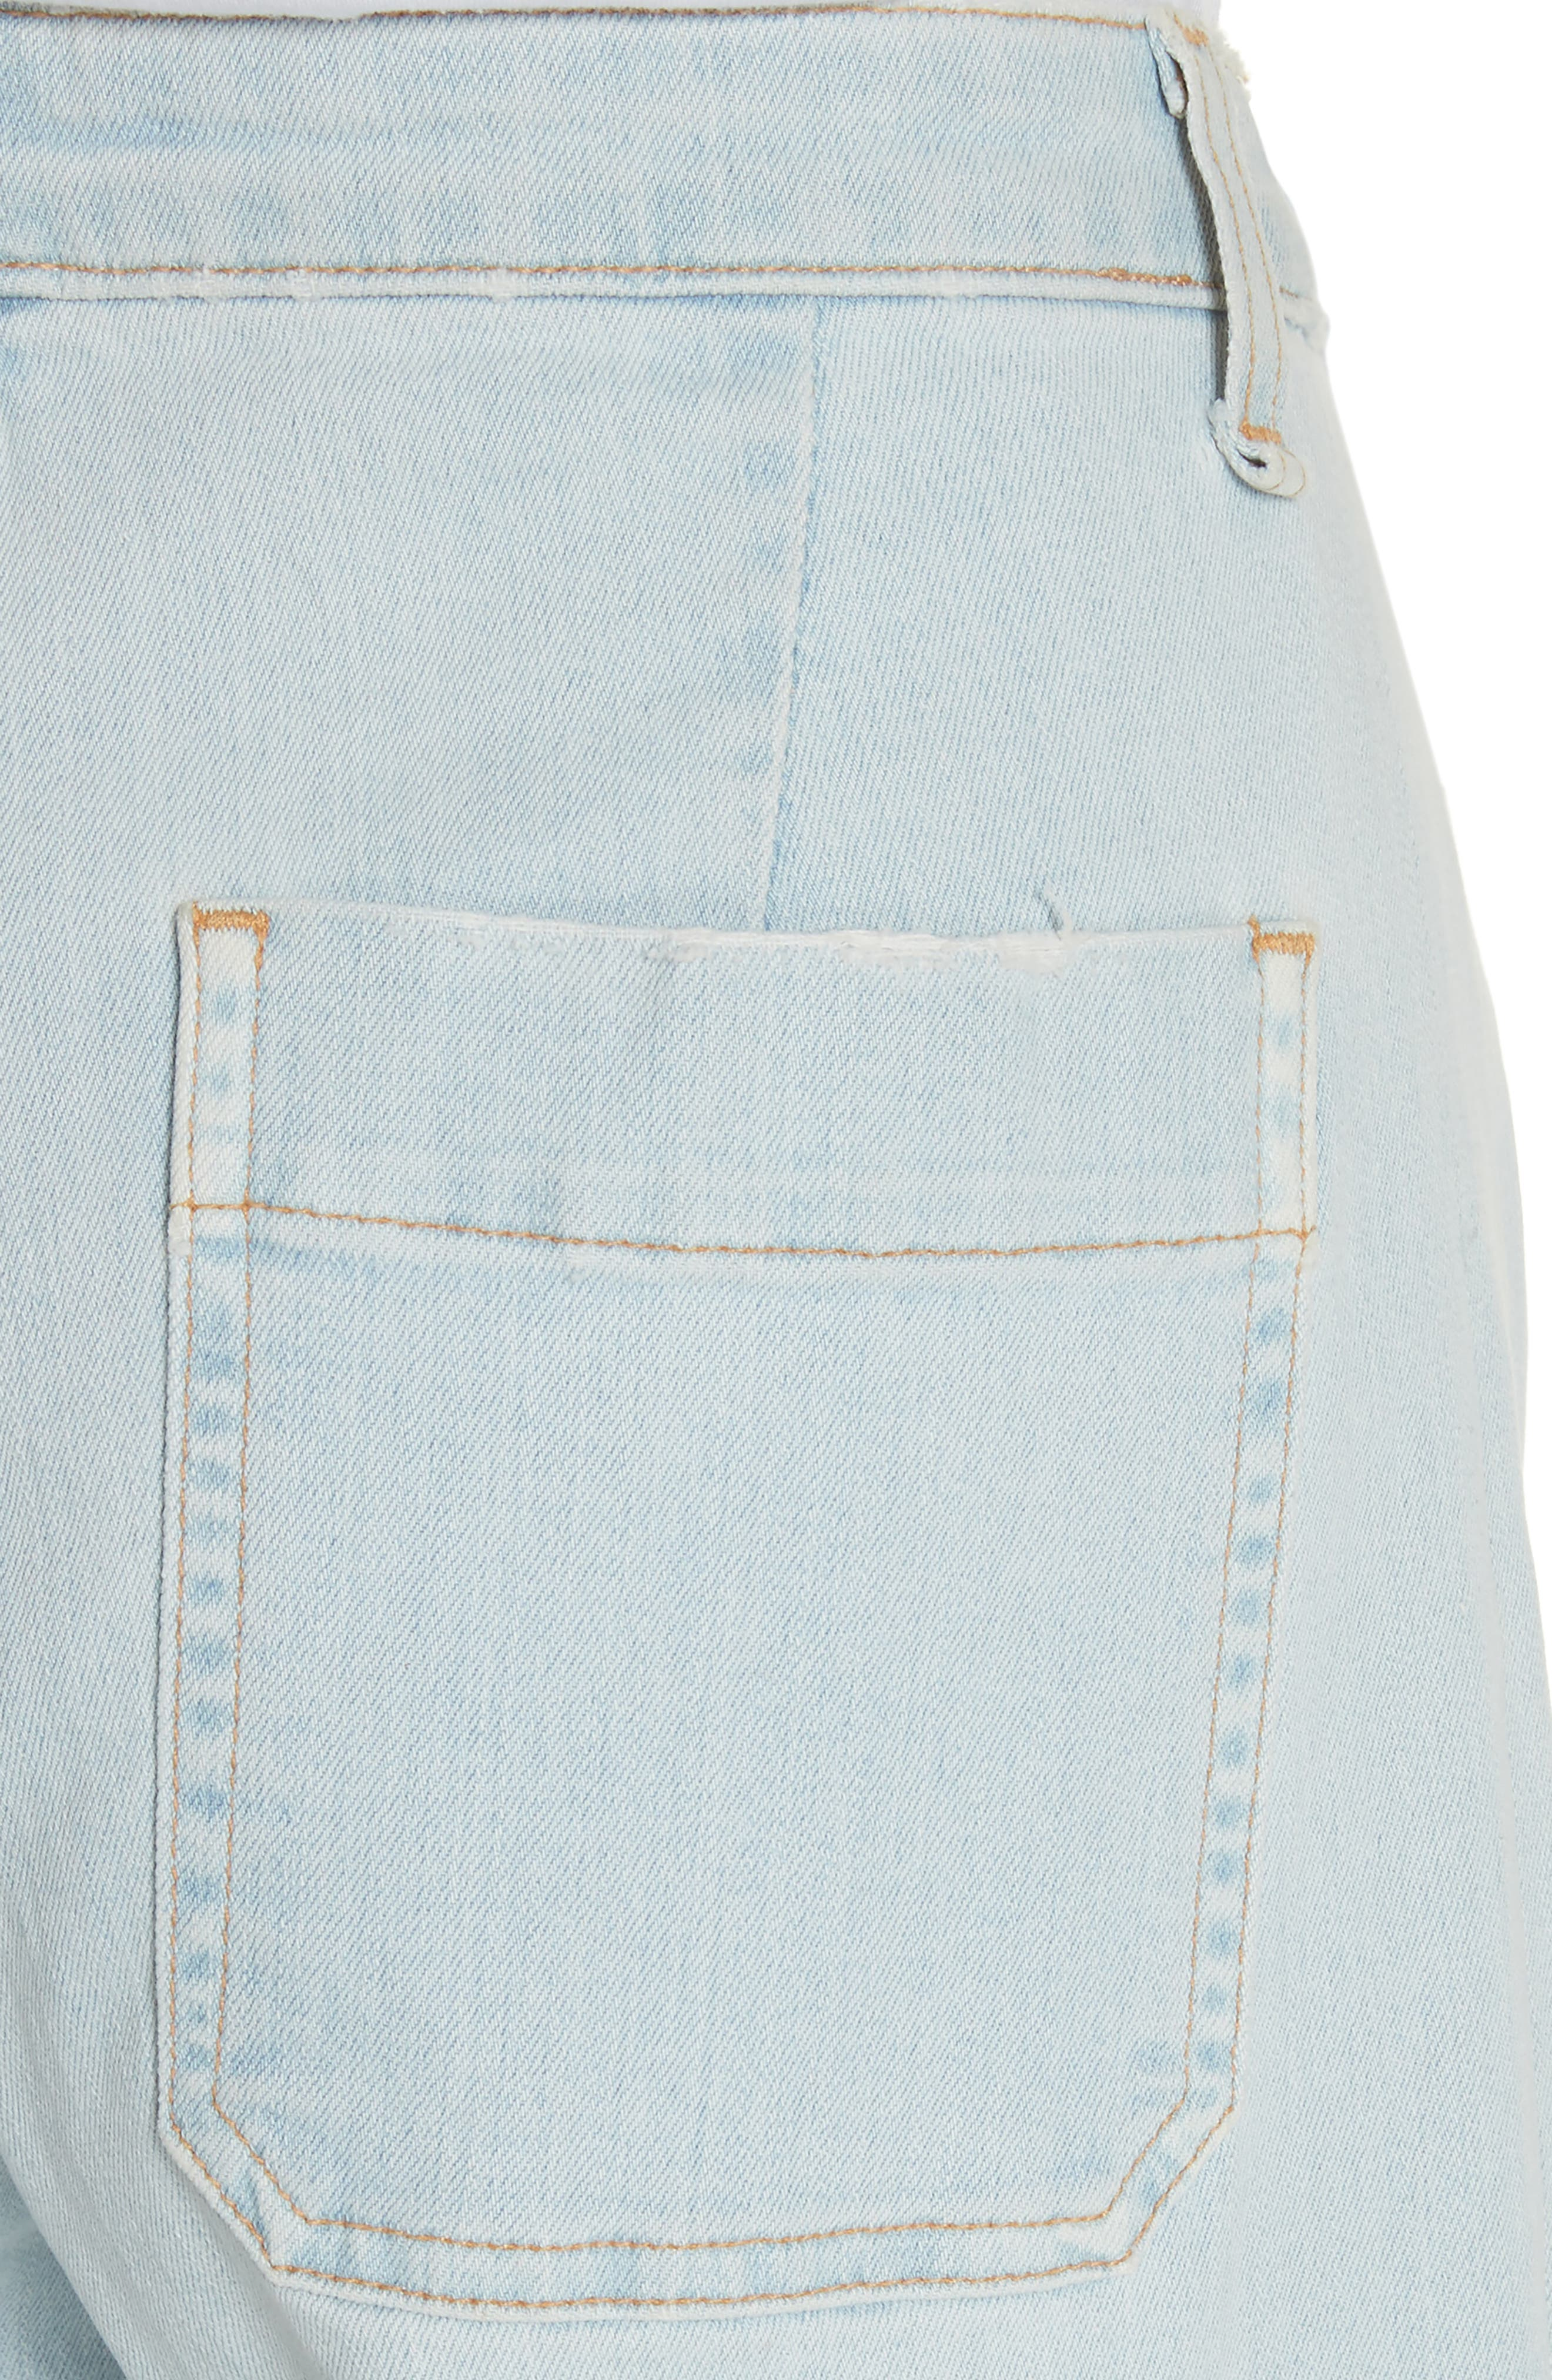 Ali High Waist Gaucho Jeans,                             Alternate thumbnail 4, color,                             400